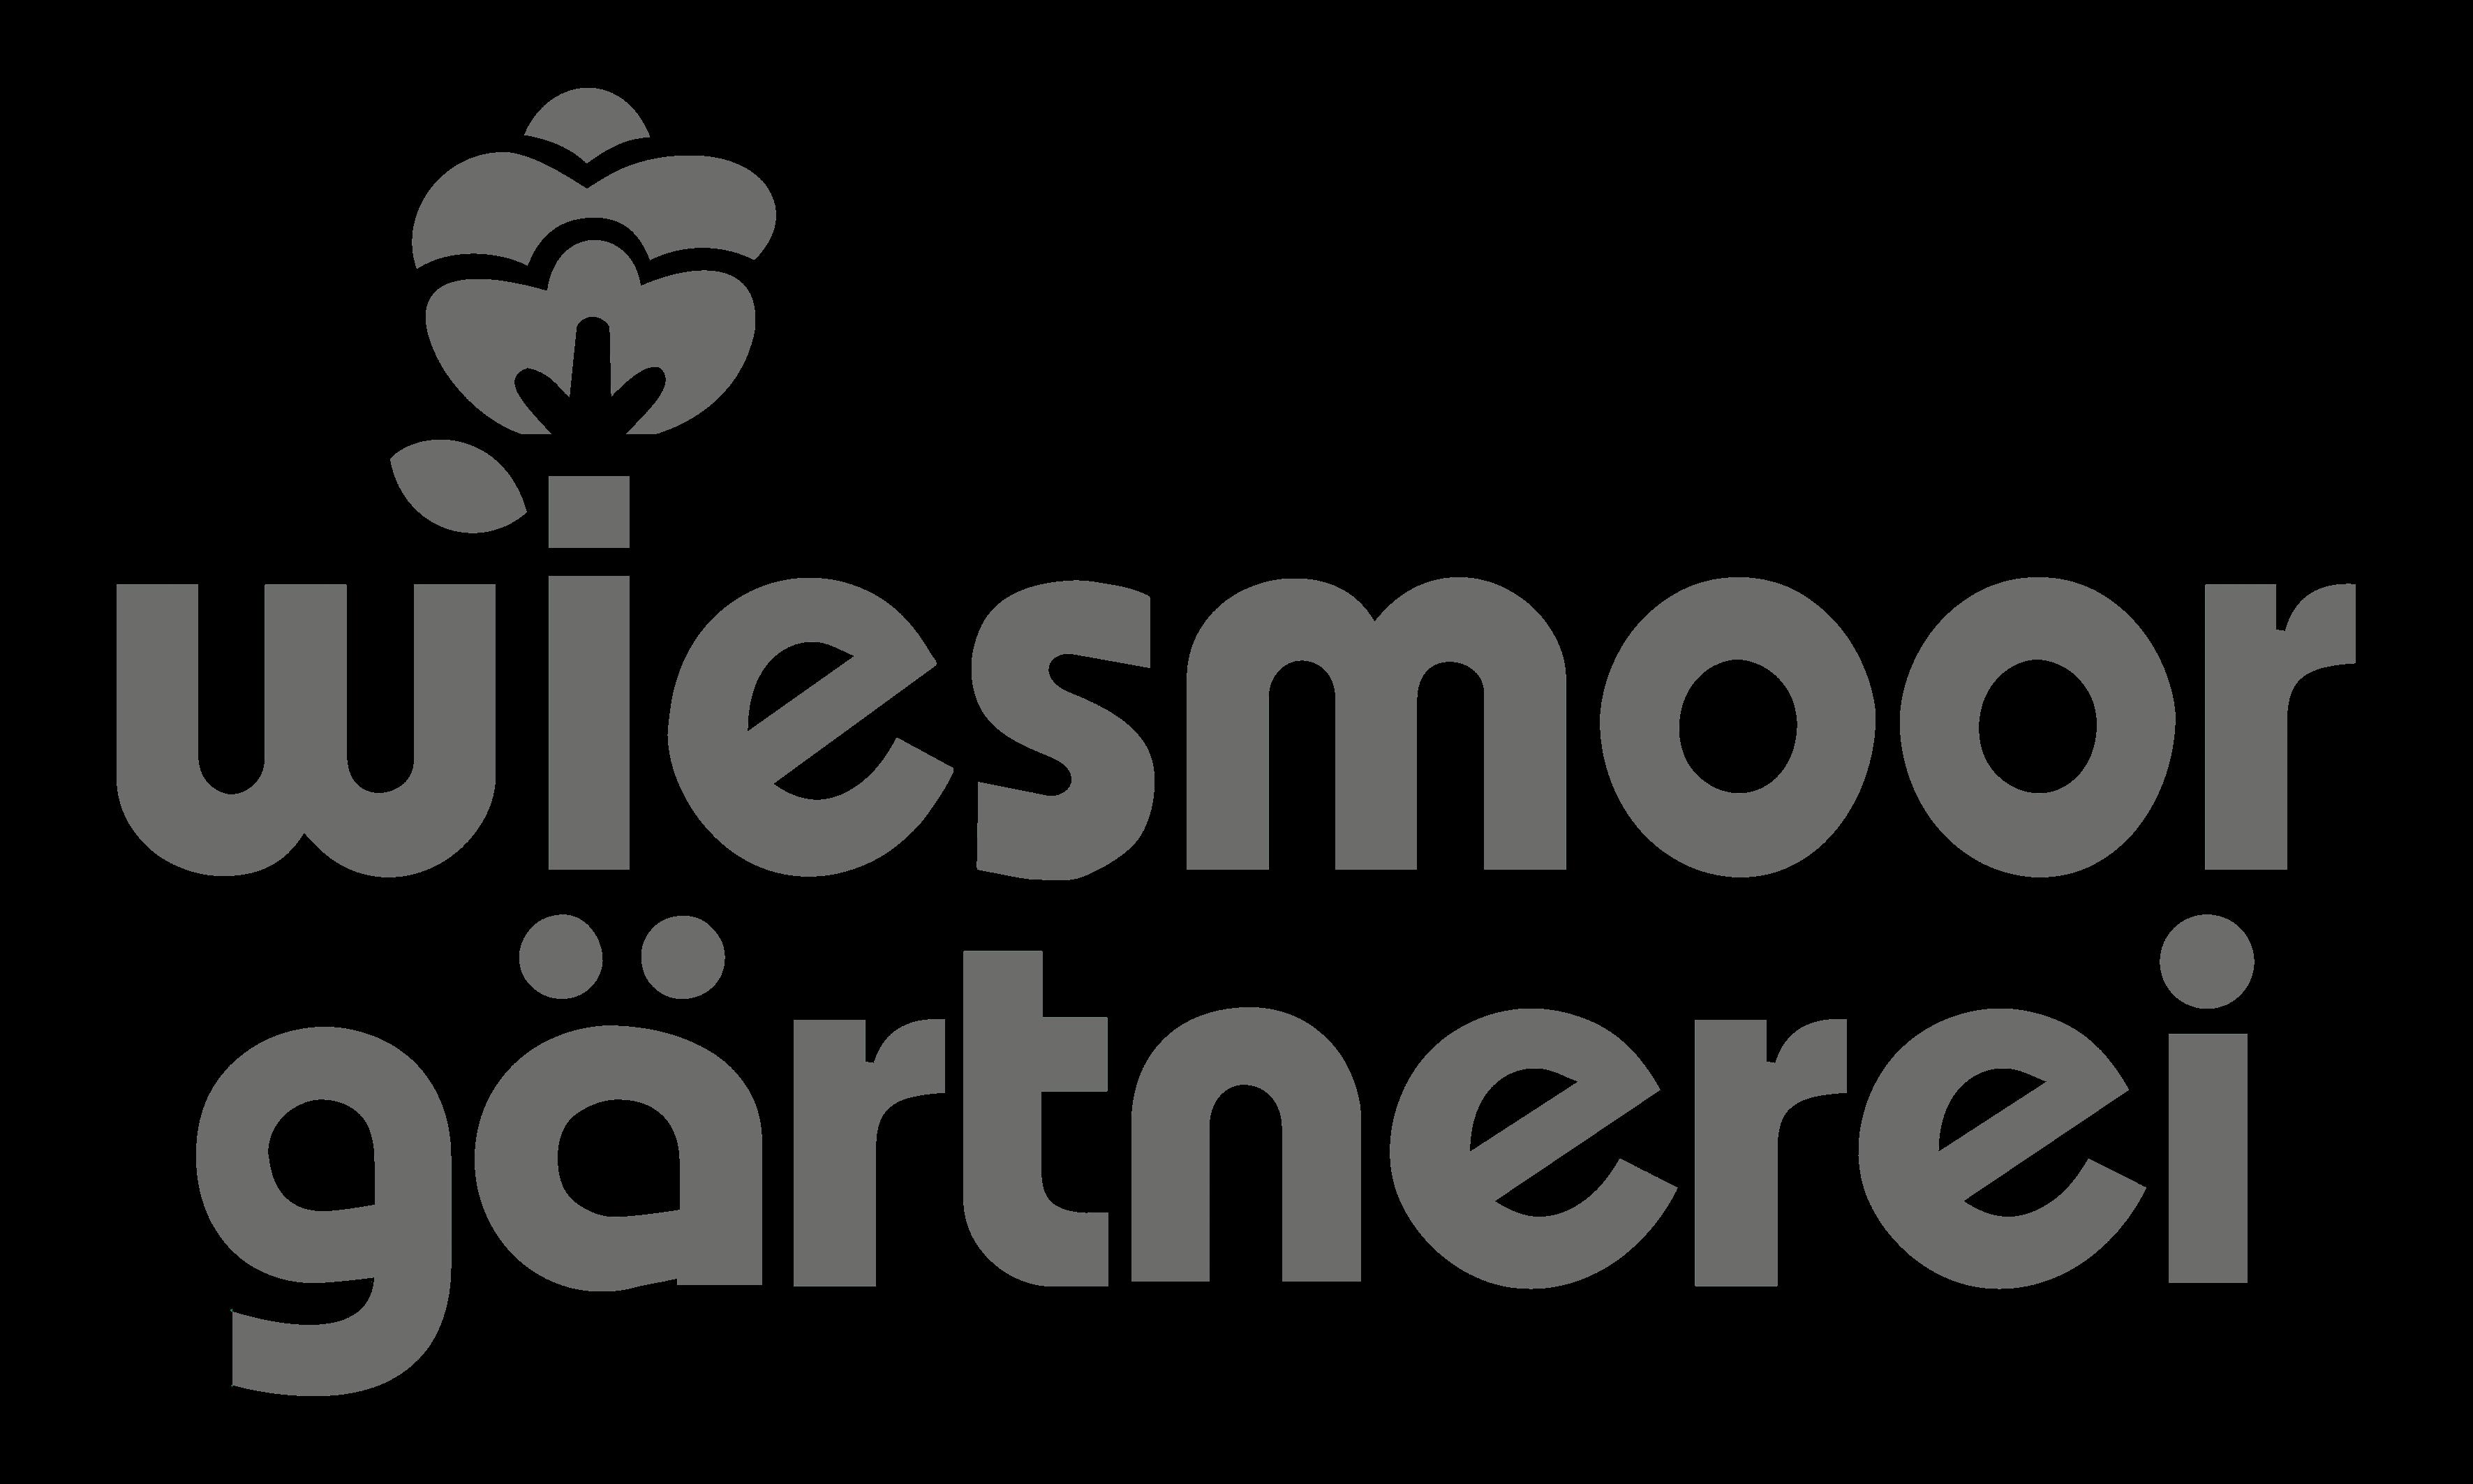 Wiesmoor-Gärtnerei-Logo2-dunkelgrau